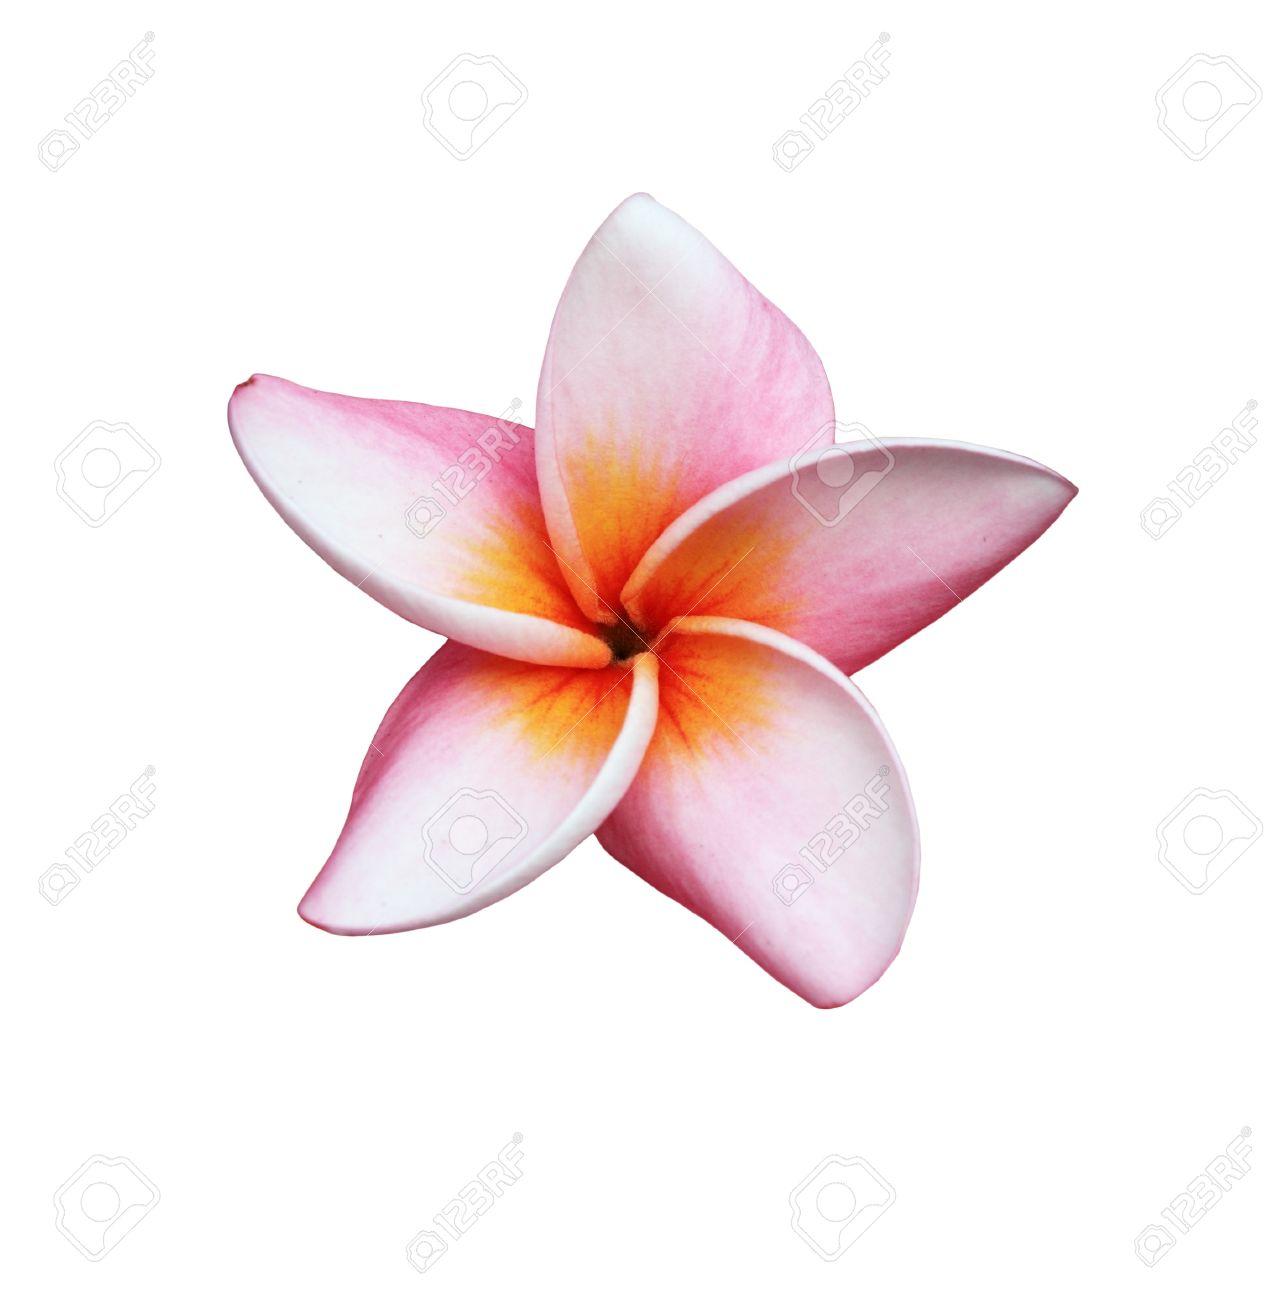 fleur frangipanier Fleur de frangipanier ou Plumeria